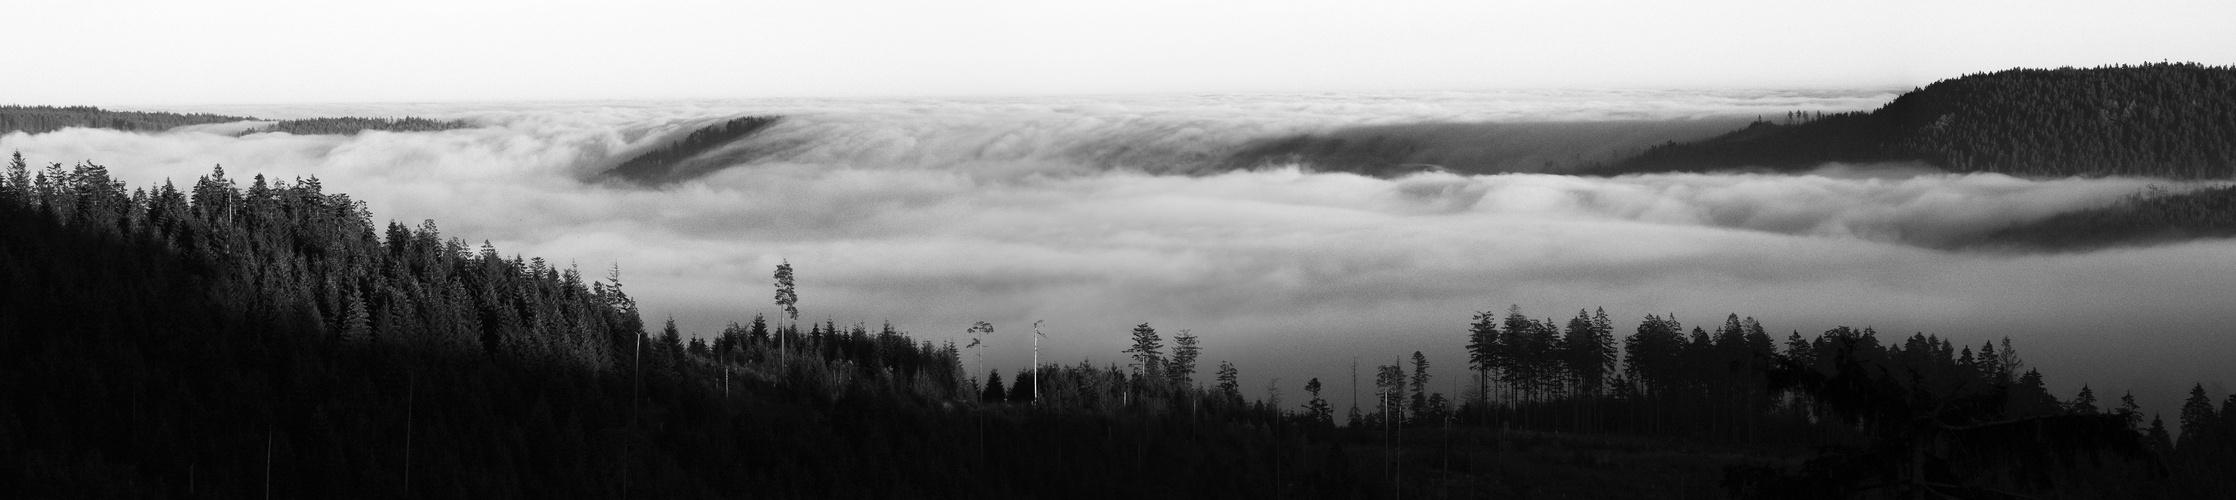 Die große Nebelflut